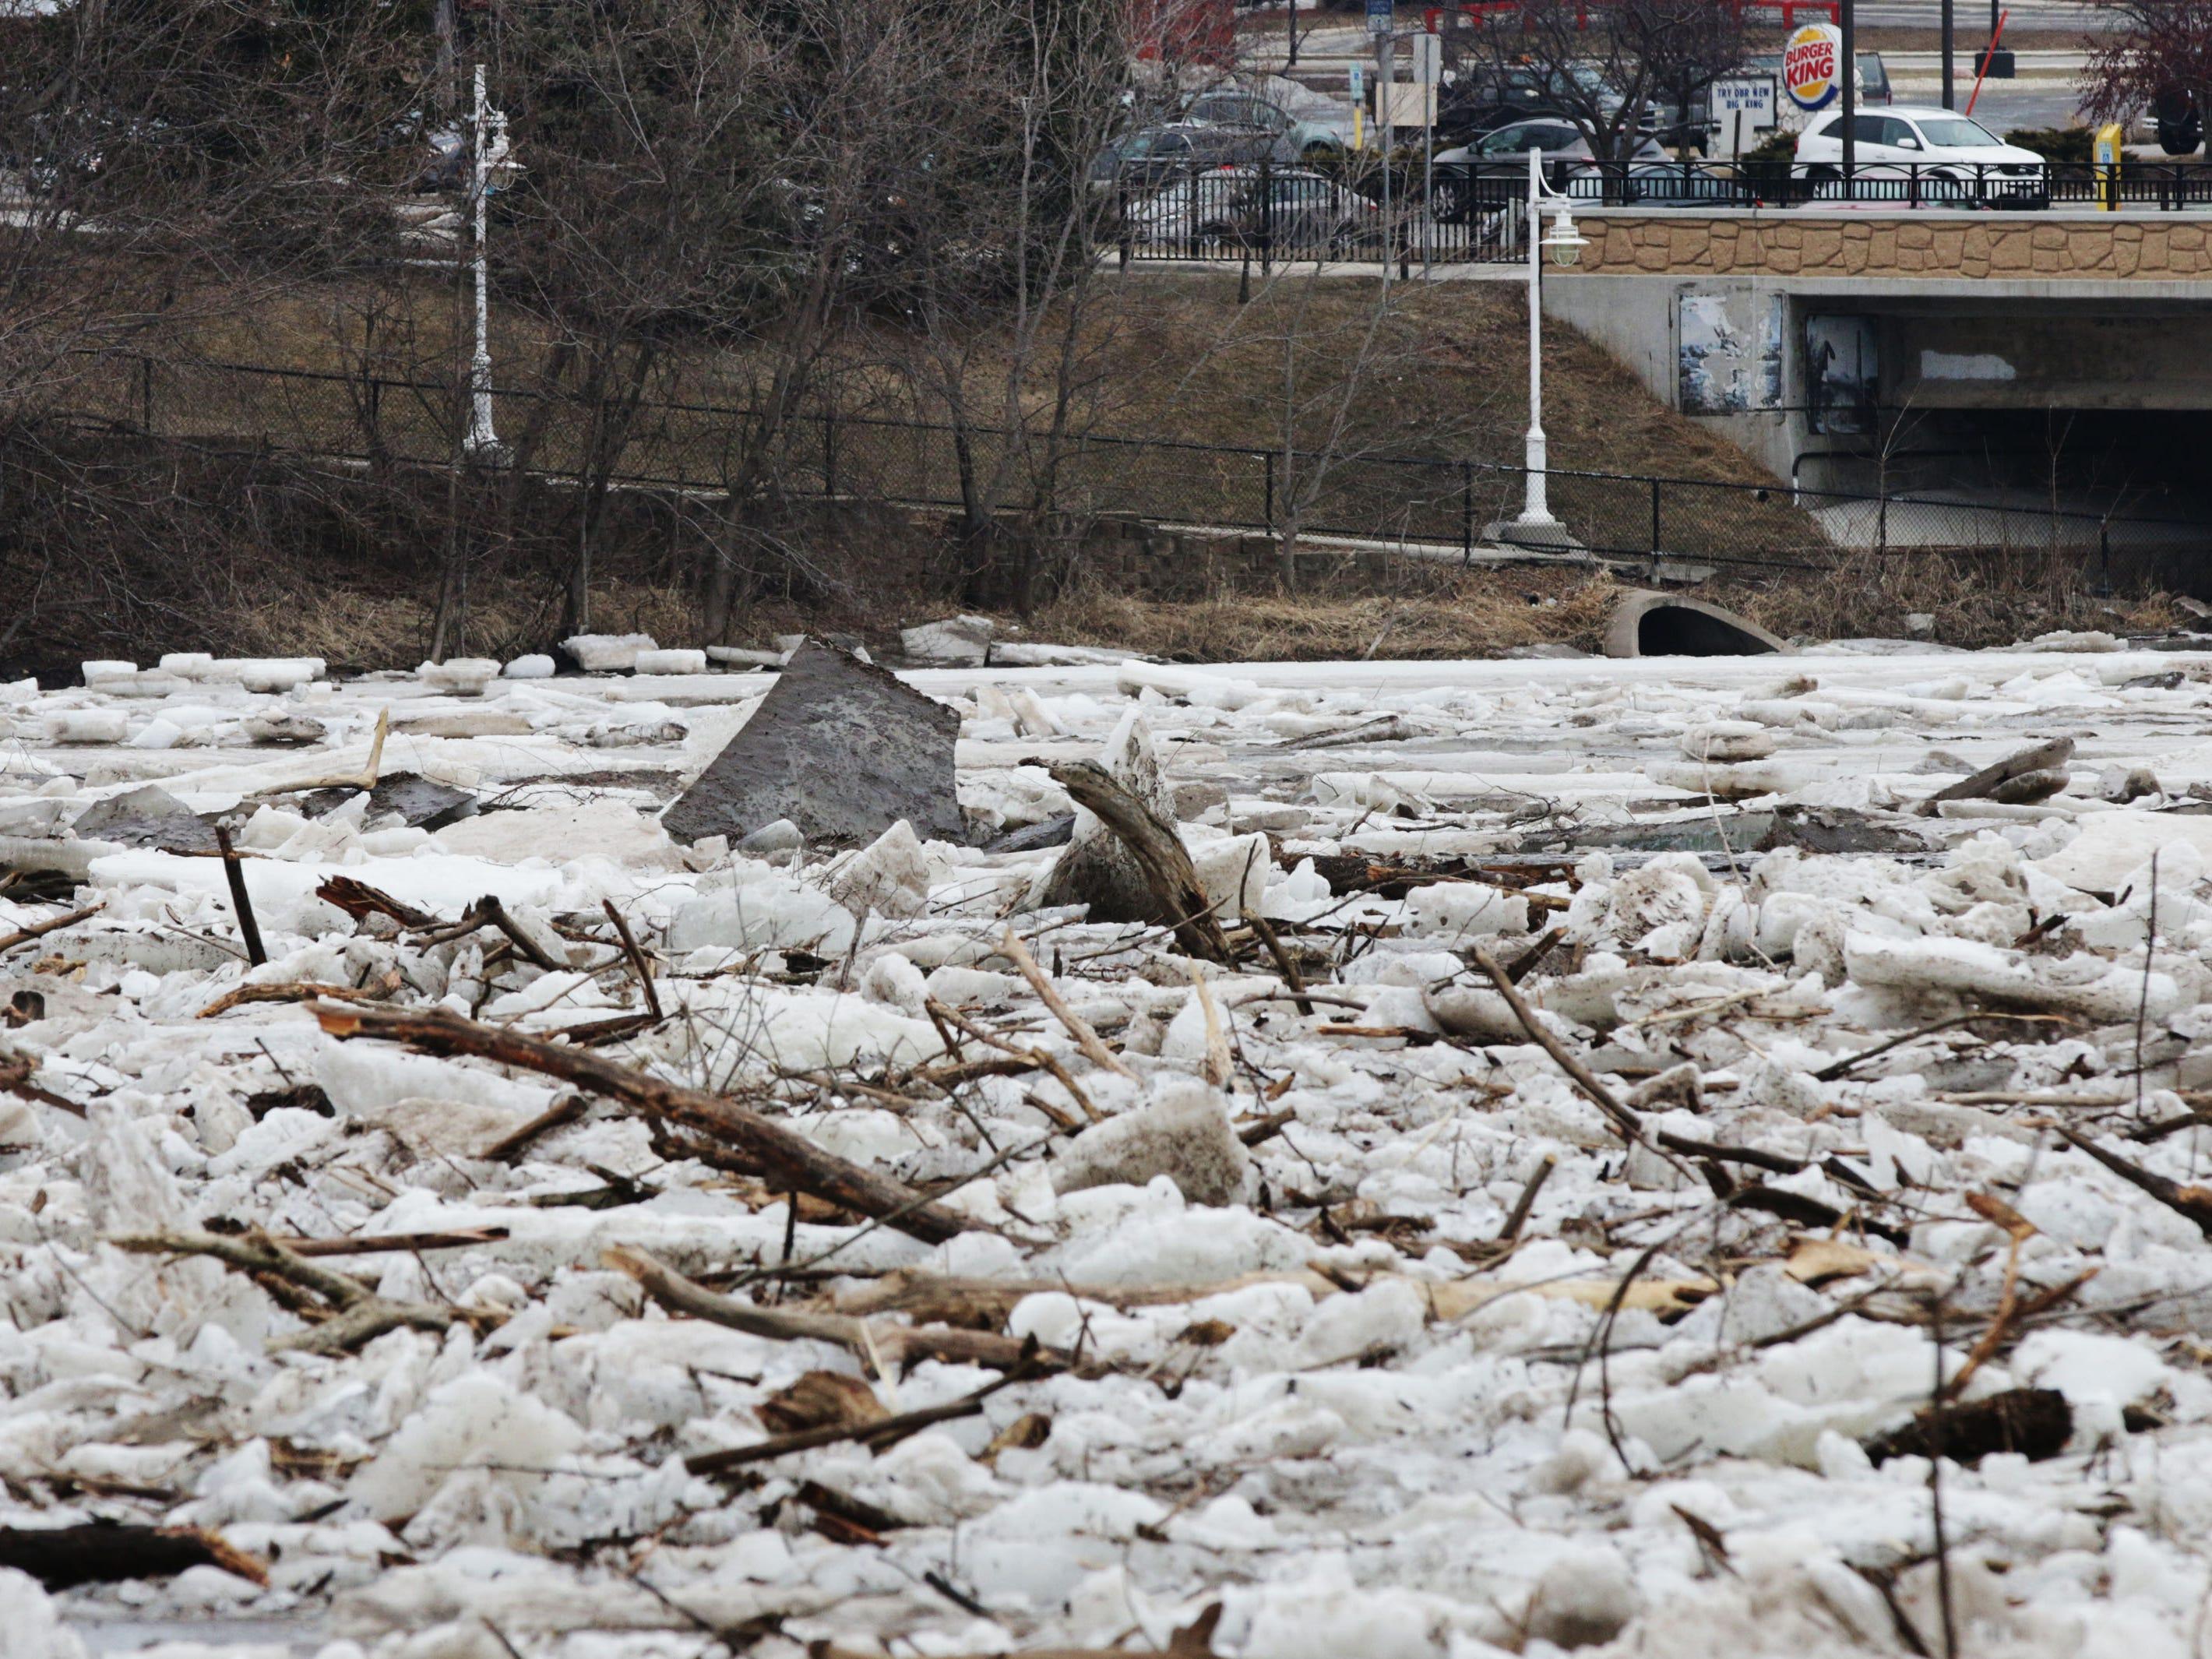 Ice jams on the Sheboygan River near 14th Street, Wednesday, March 20, 2019, in Sheboygan, Wis.